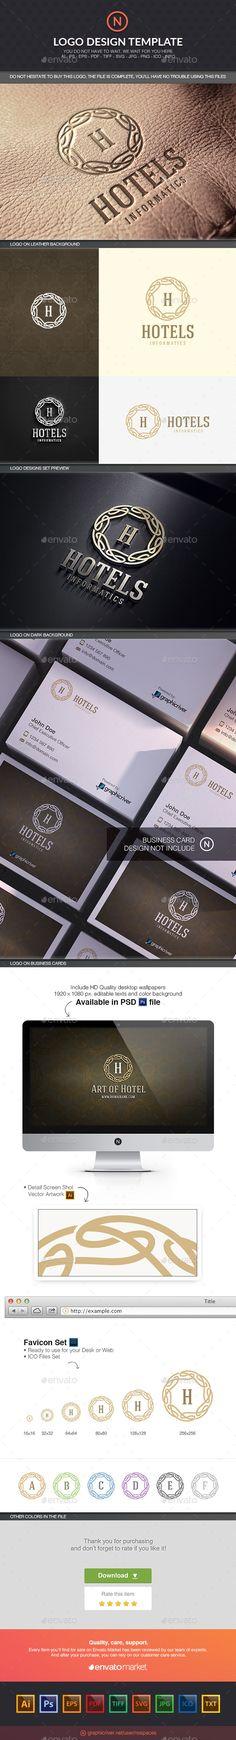 Art Hotel Logo Template #design #logotype Download: http://graphicriver.net/item/art-hotel/10597748?ref=ksioks